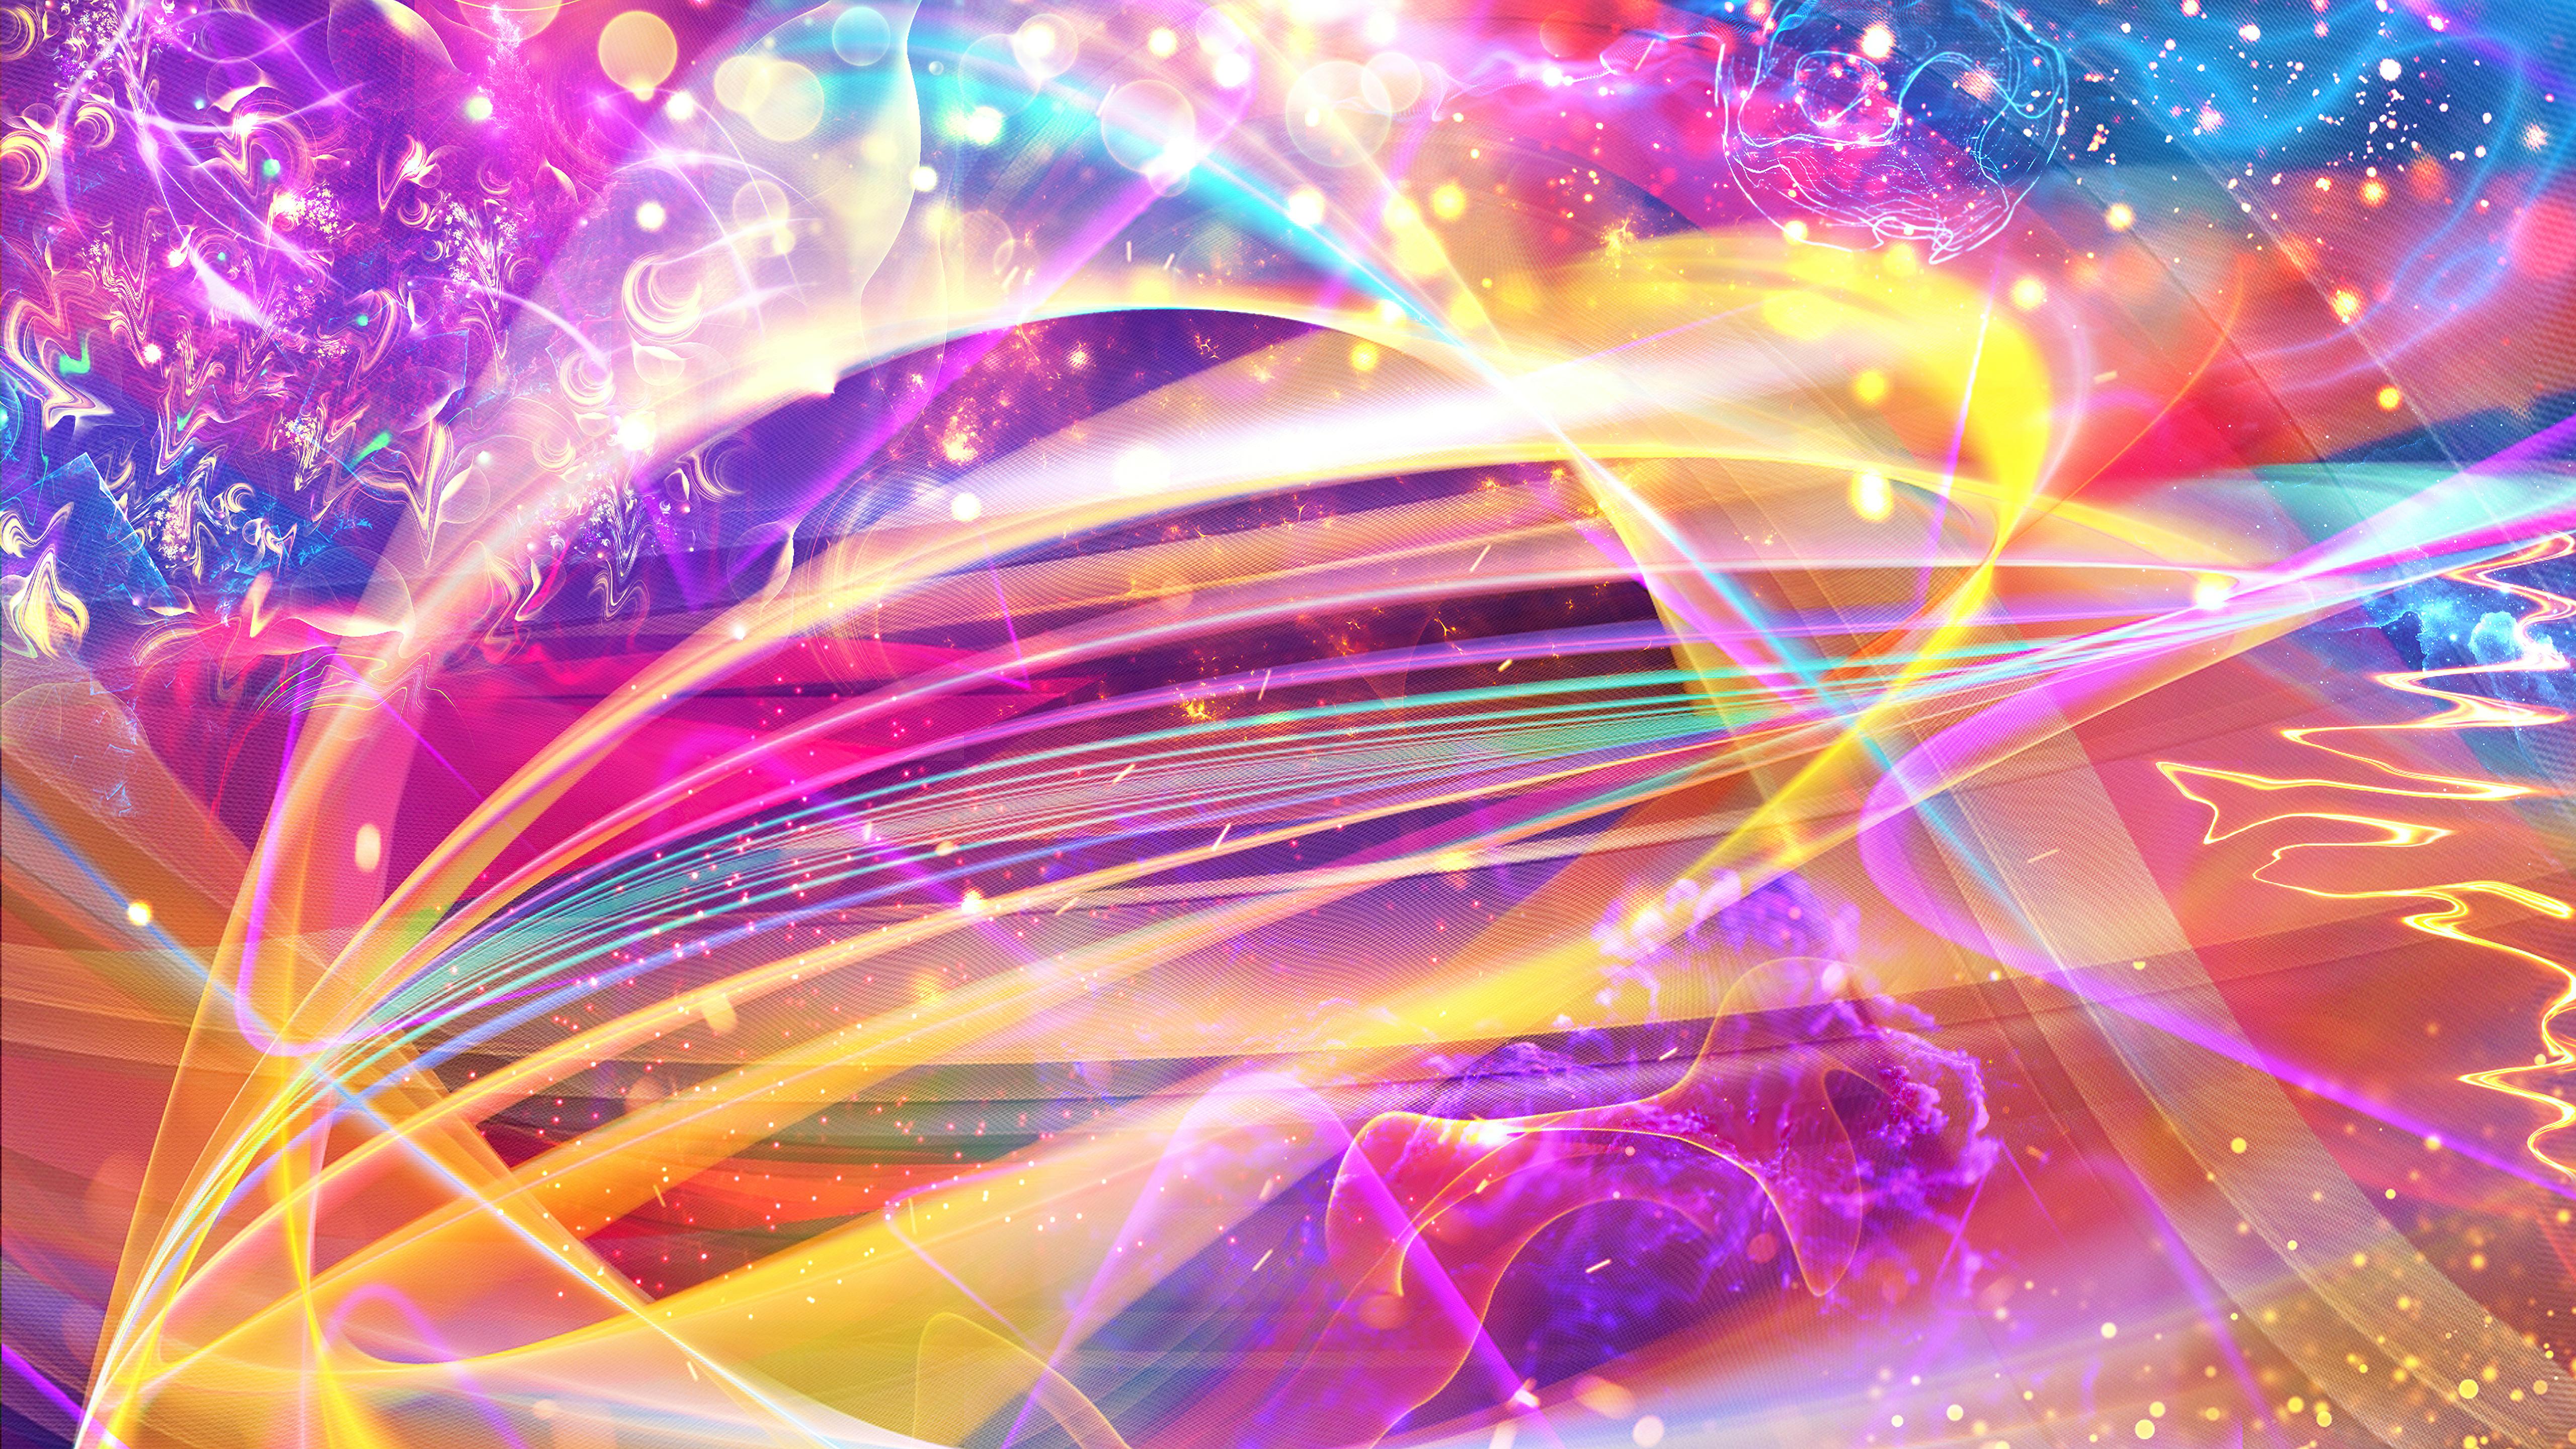 colors helios 4k 1616870952 - Colors Helios 4k - Colors Helios 4k wallpapers